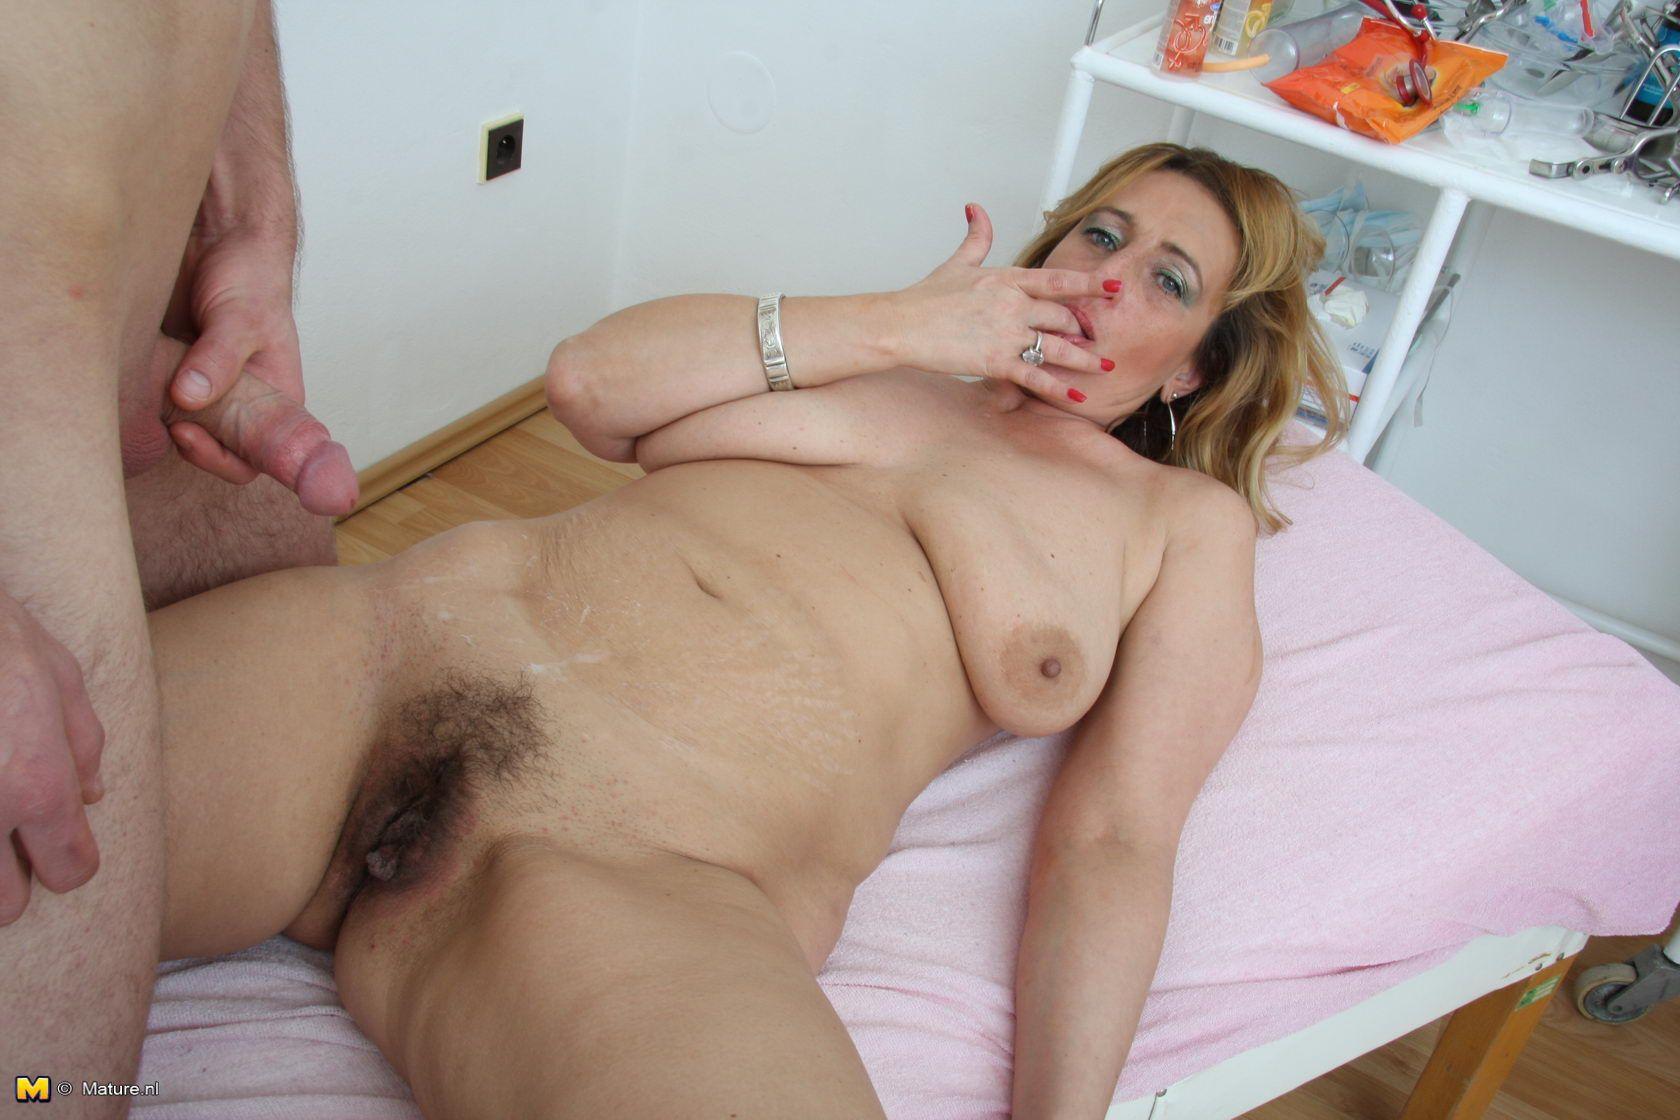 Bachelorette party fiancee fucked stripper